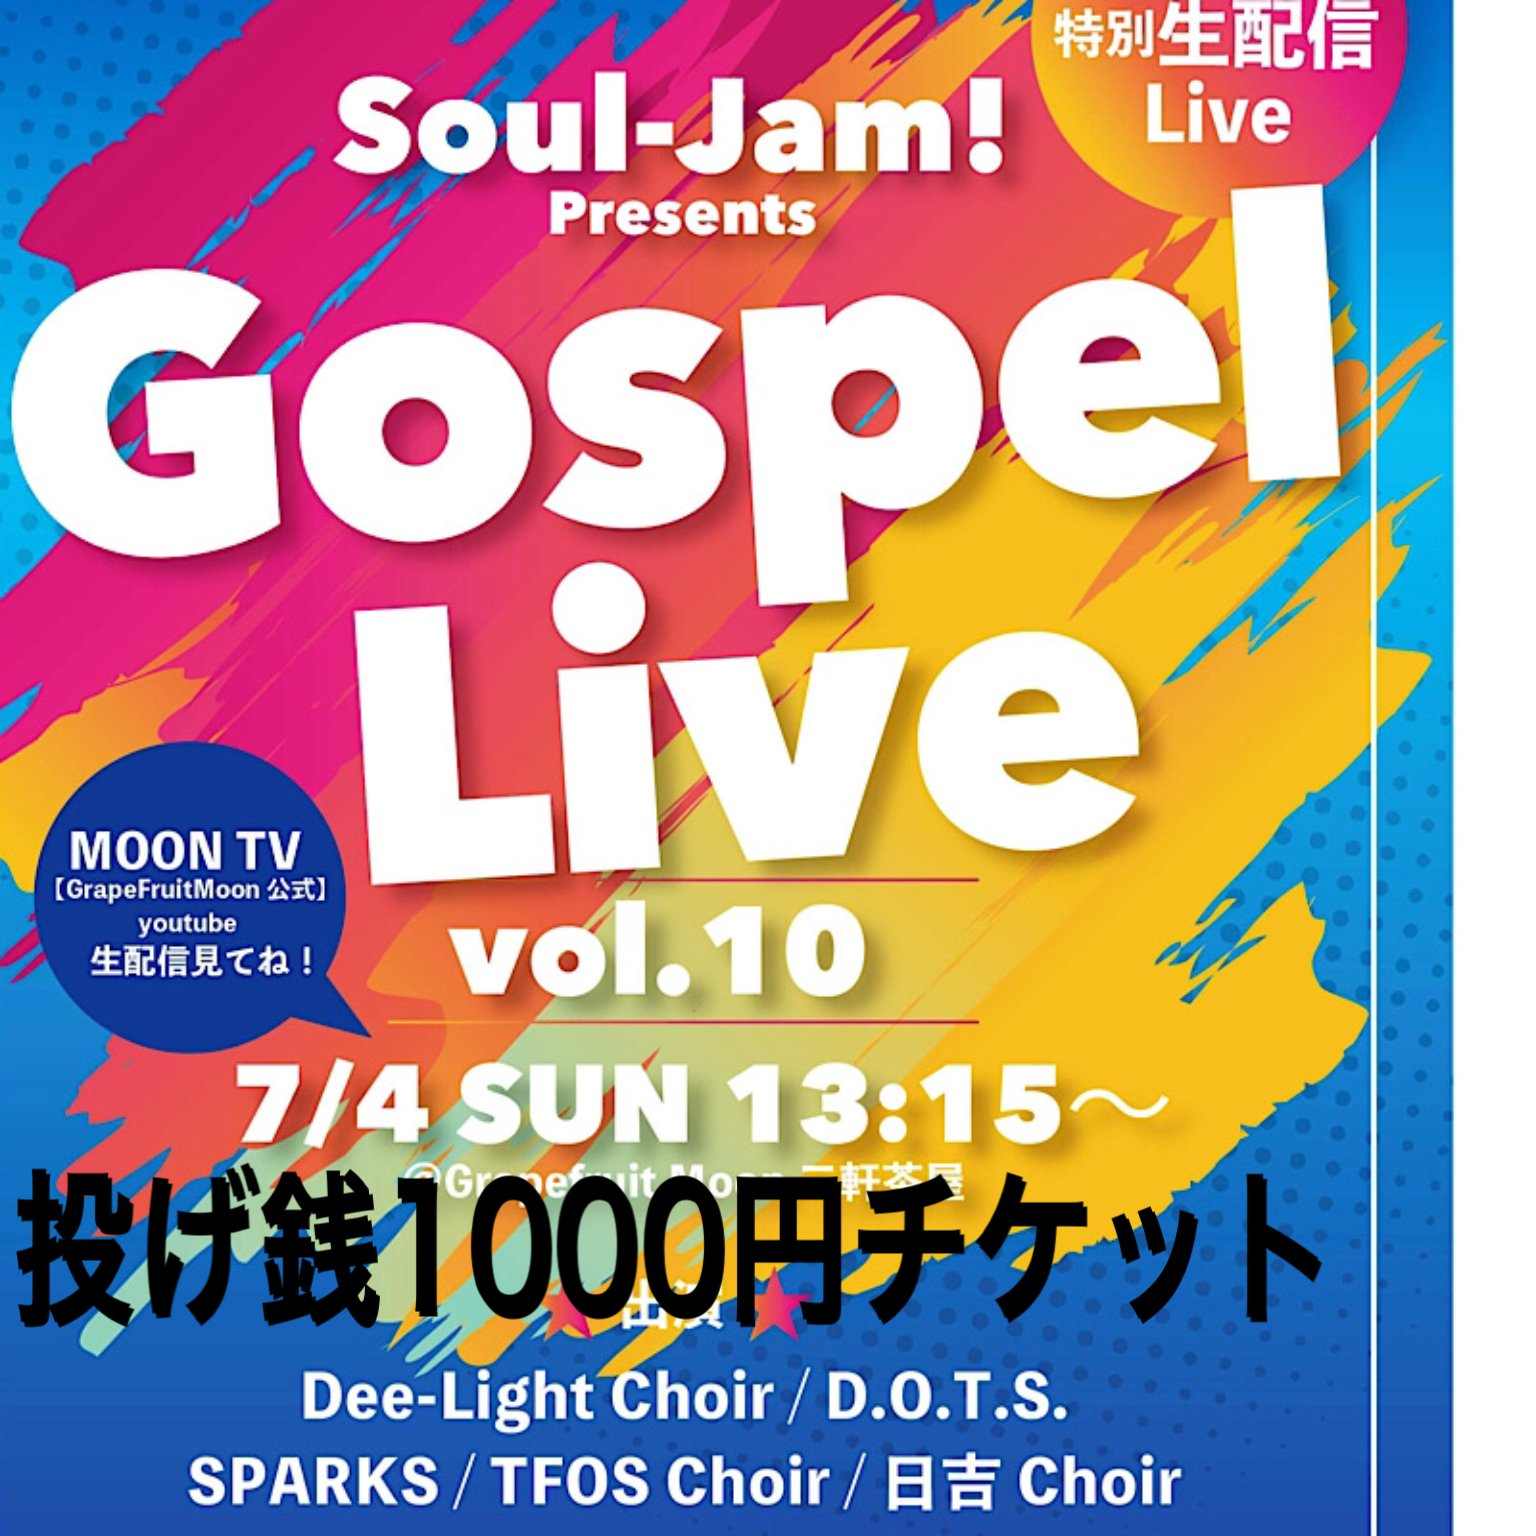 Soul-Jam! Gospel Live vol.10 投げ銭ウェブチケット1000円のイメージその1